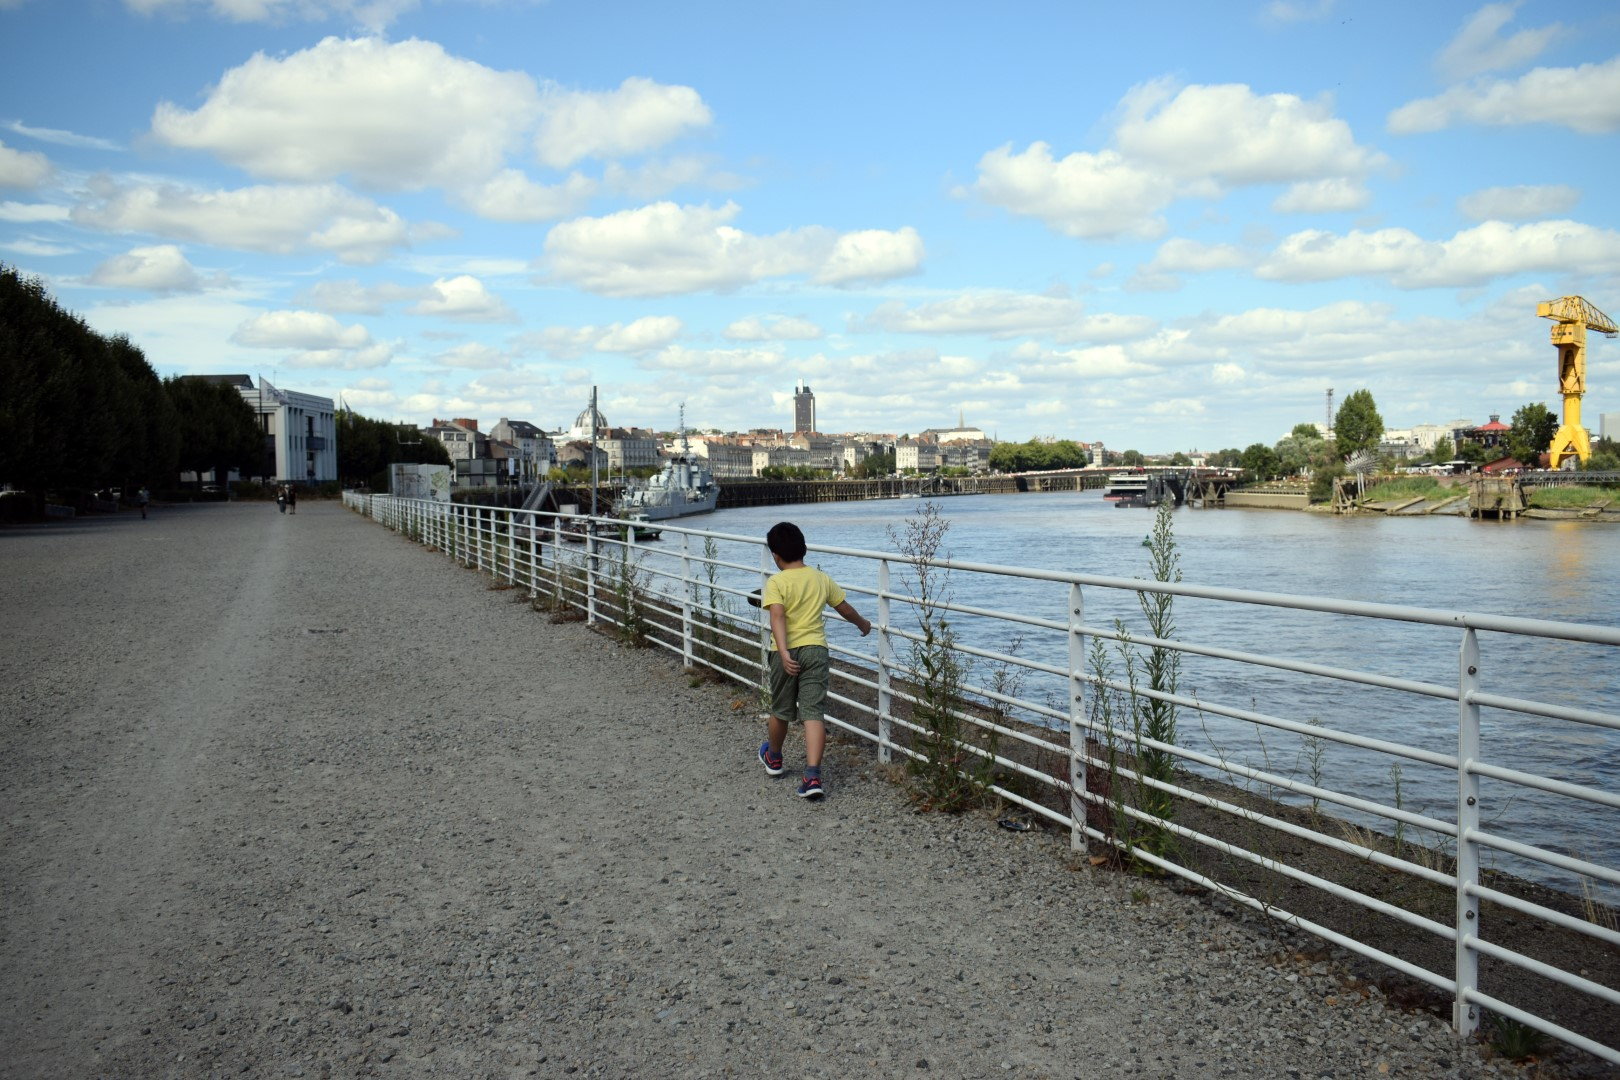 Jardin extraordinaire, Quai Marquis d'Aiguillon, Nantes, July 2020